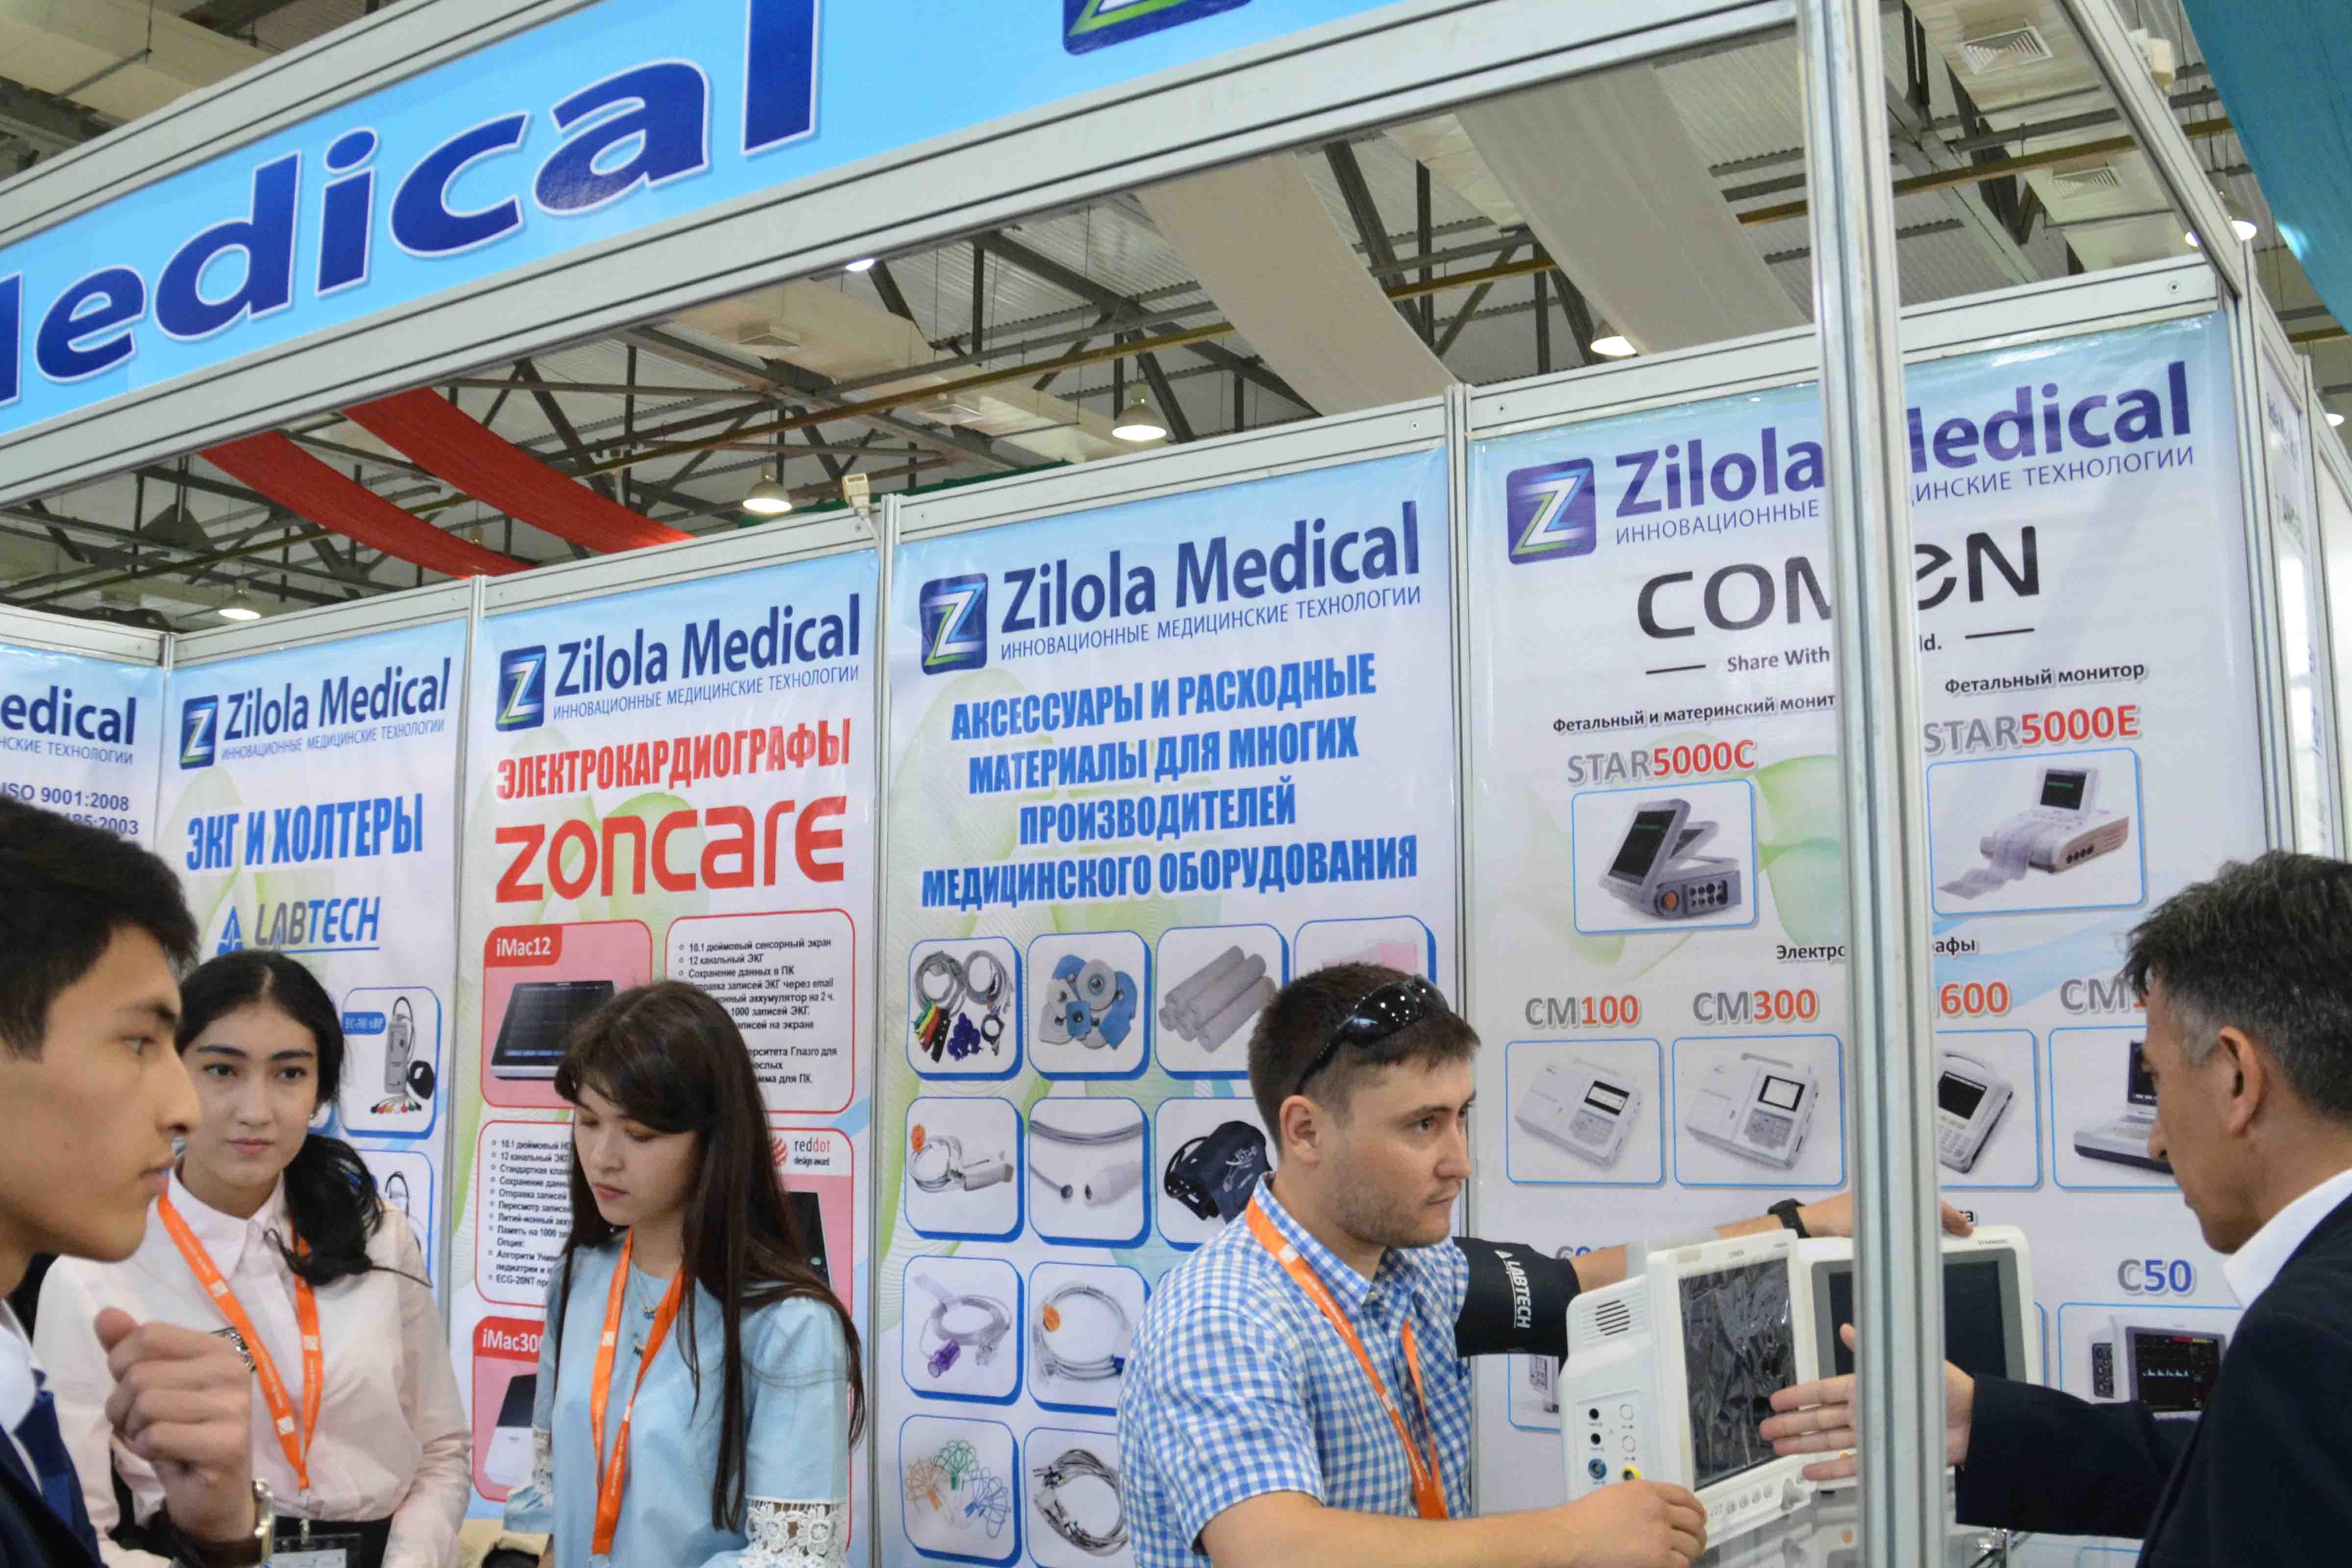 http://medicalexpress.ru/uploads/news/Tihe%202017/7.JPG